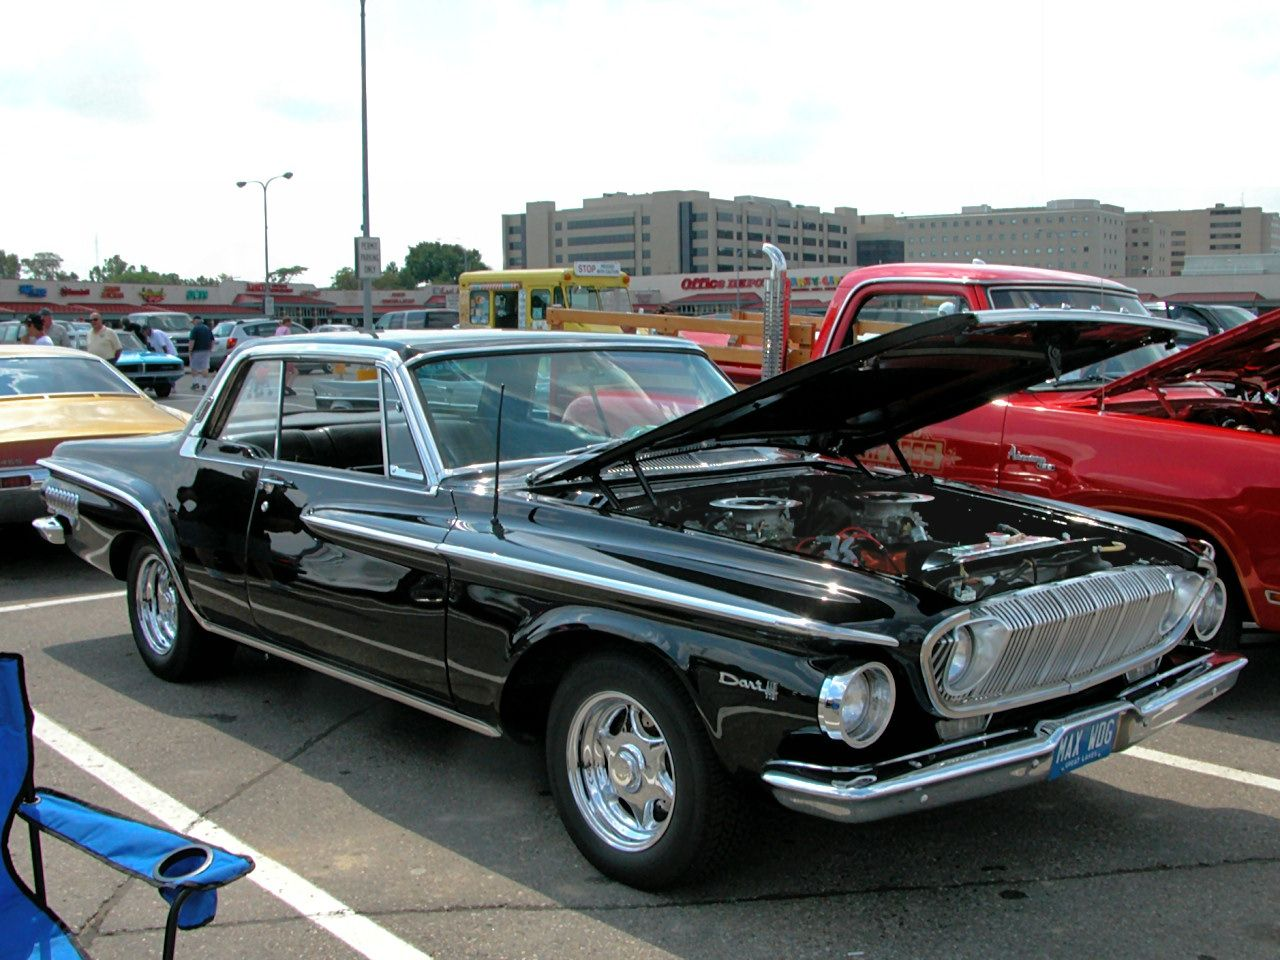 1955 dodge royal lancer convertible cream black fvr cars - Cars 1962 Dodge Dart 440 2 Door Hardtop With 413 Short Ram Max Wedge Black Fvr